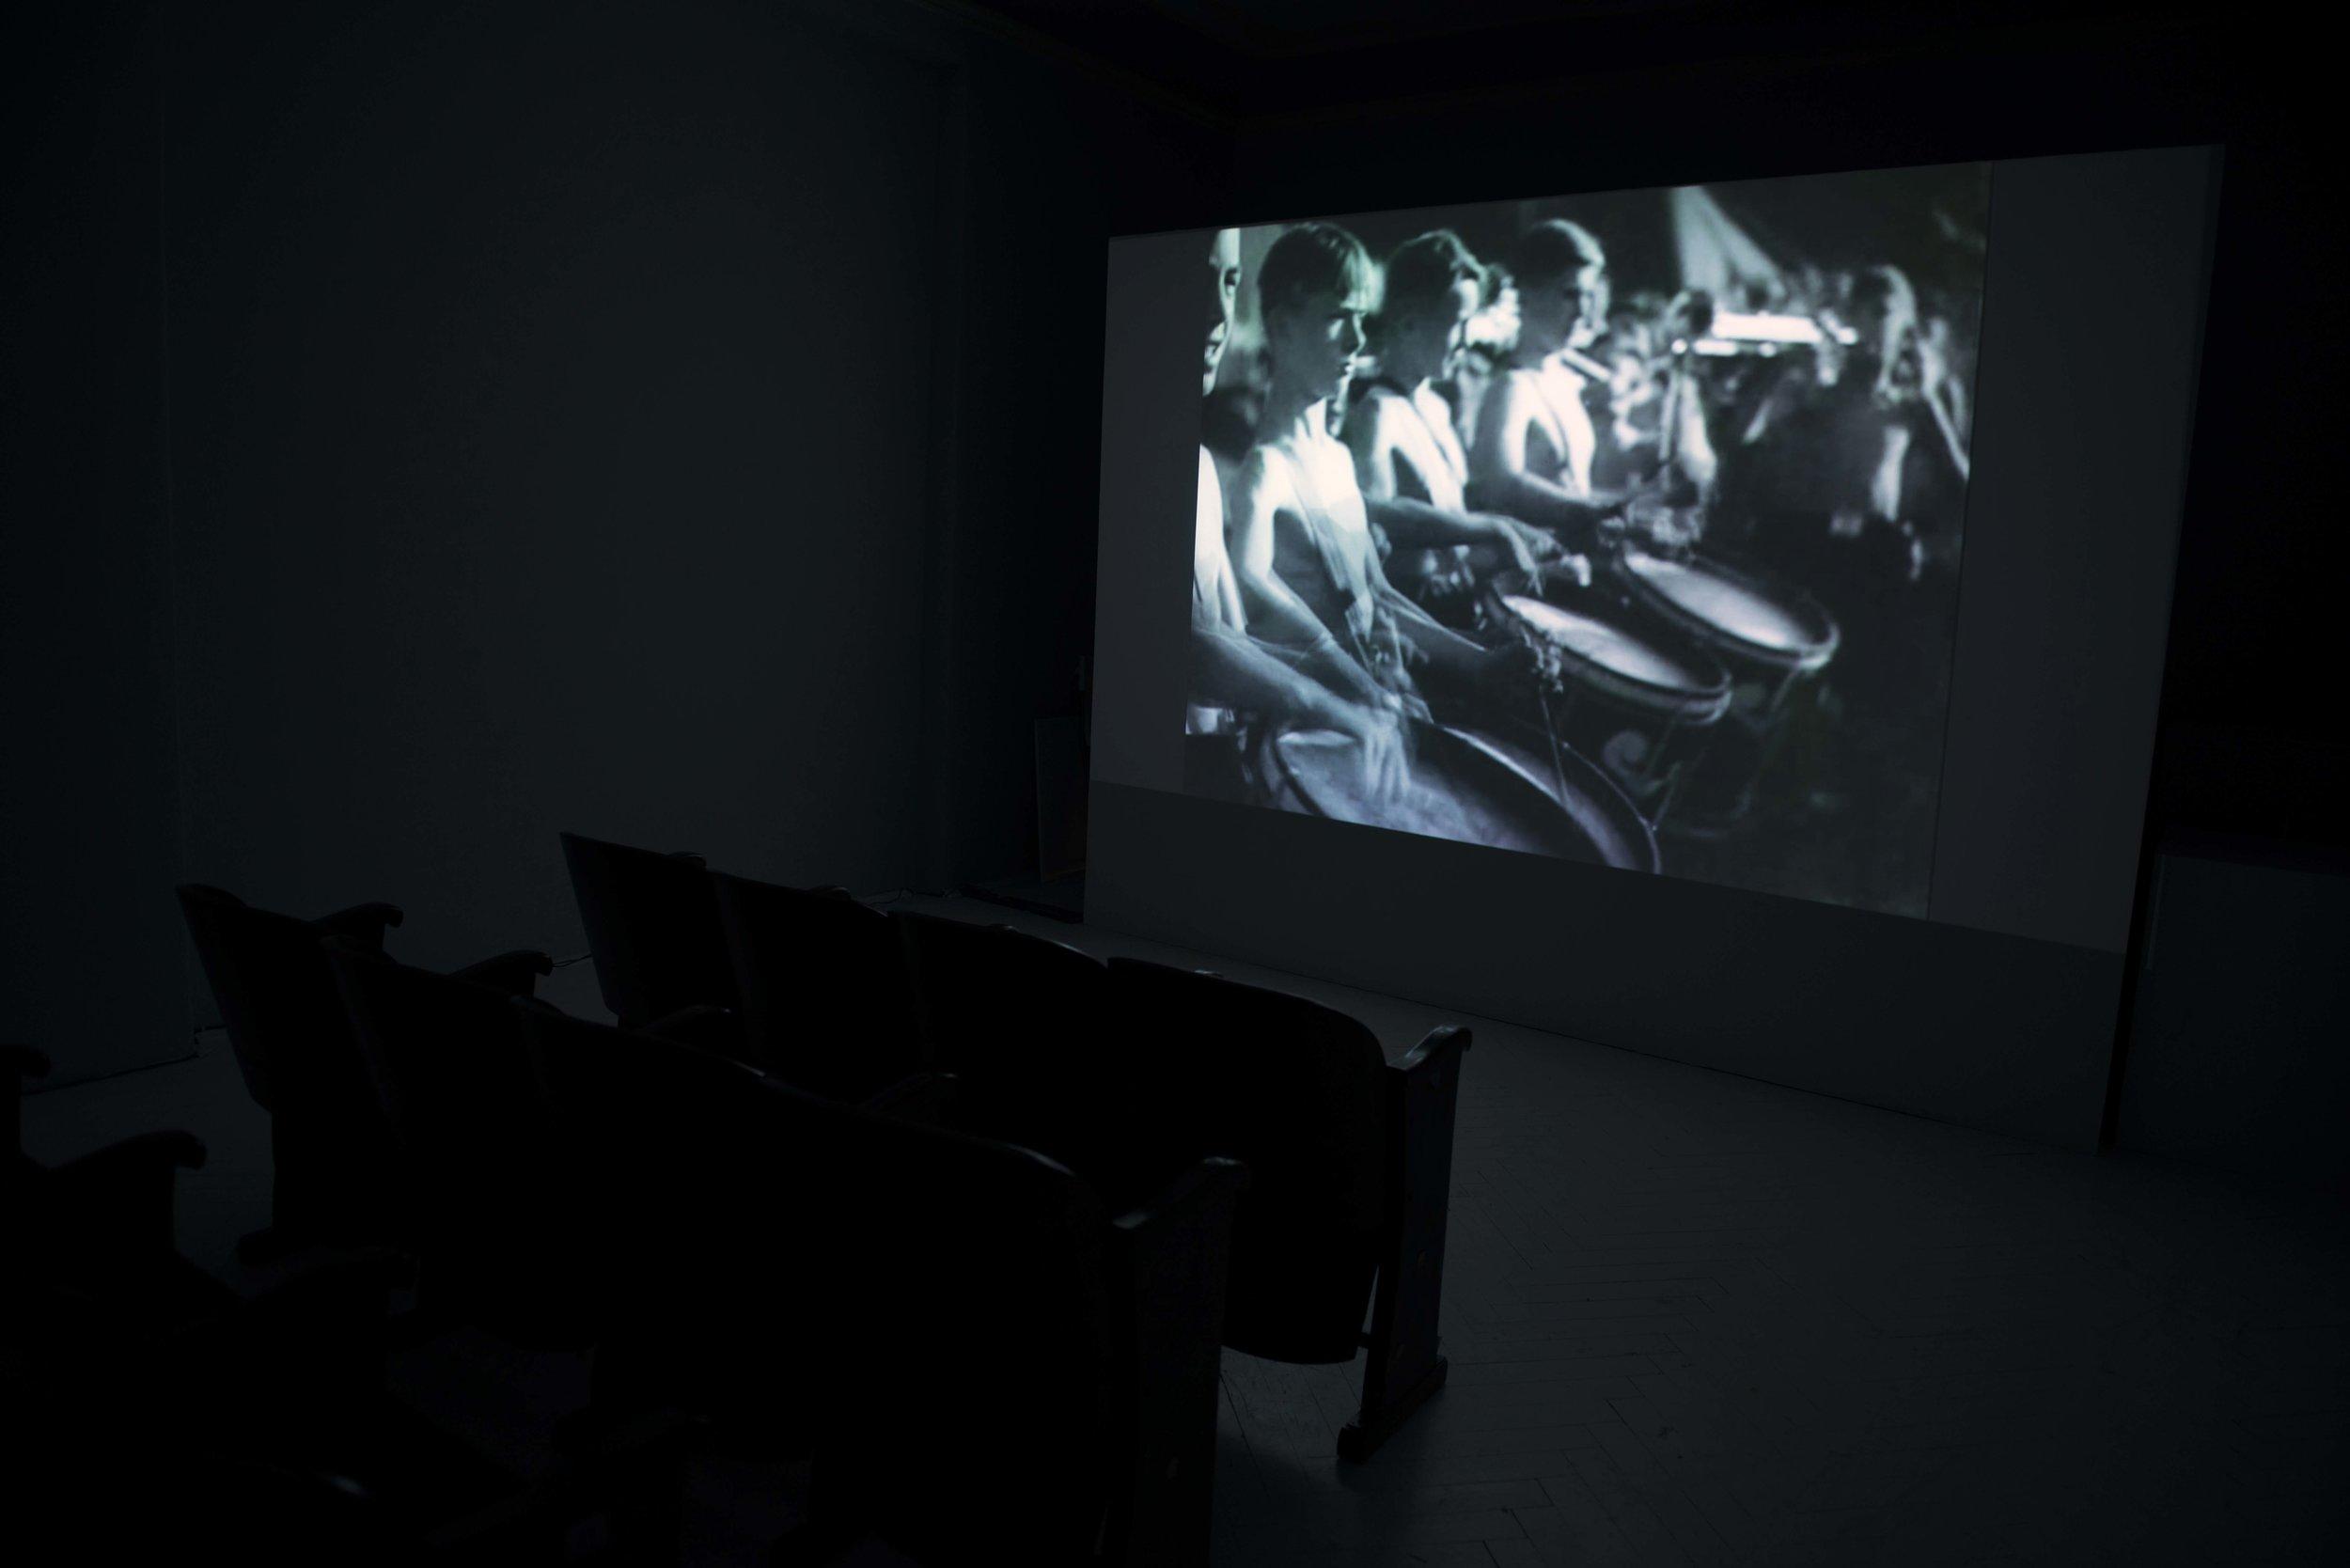 Triumph der abwesenheit (2009) by Gregor Różański